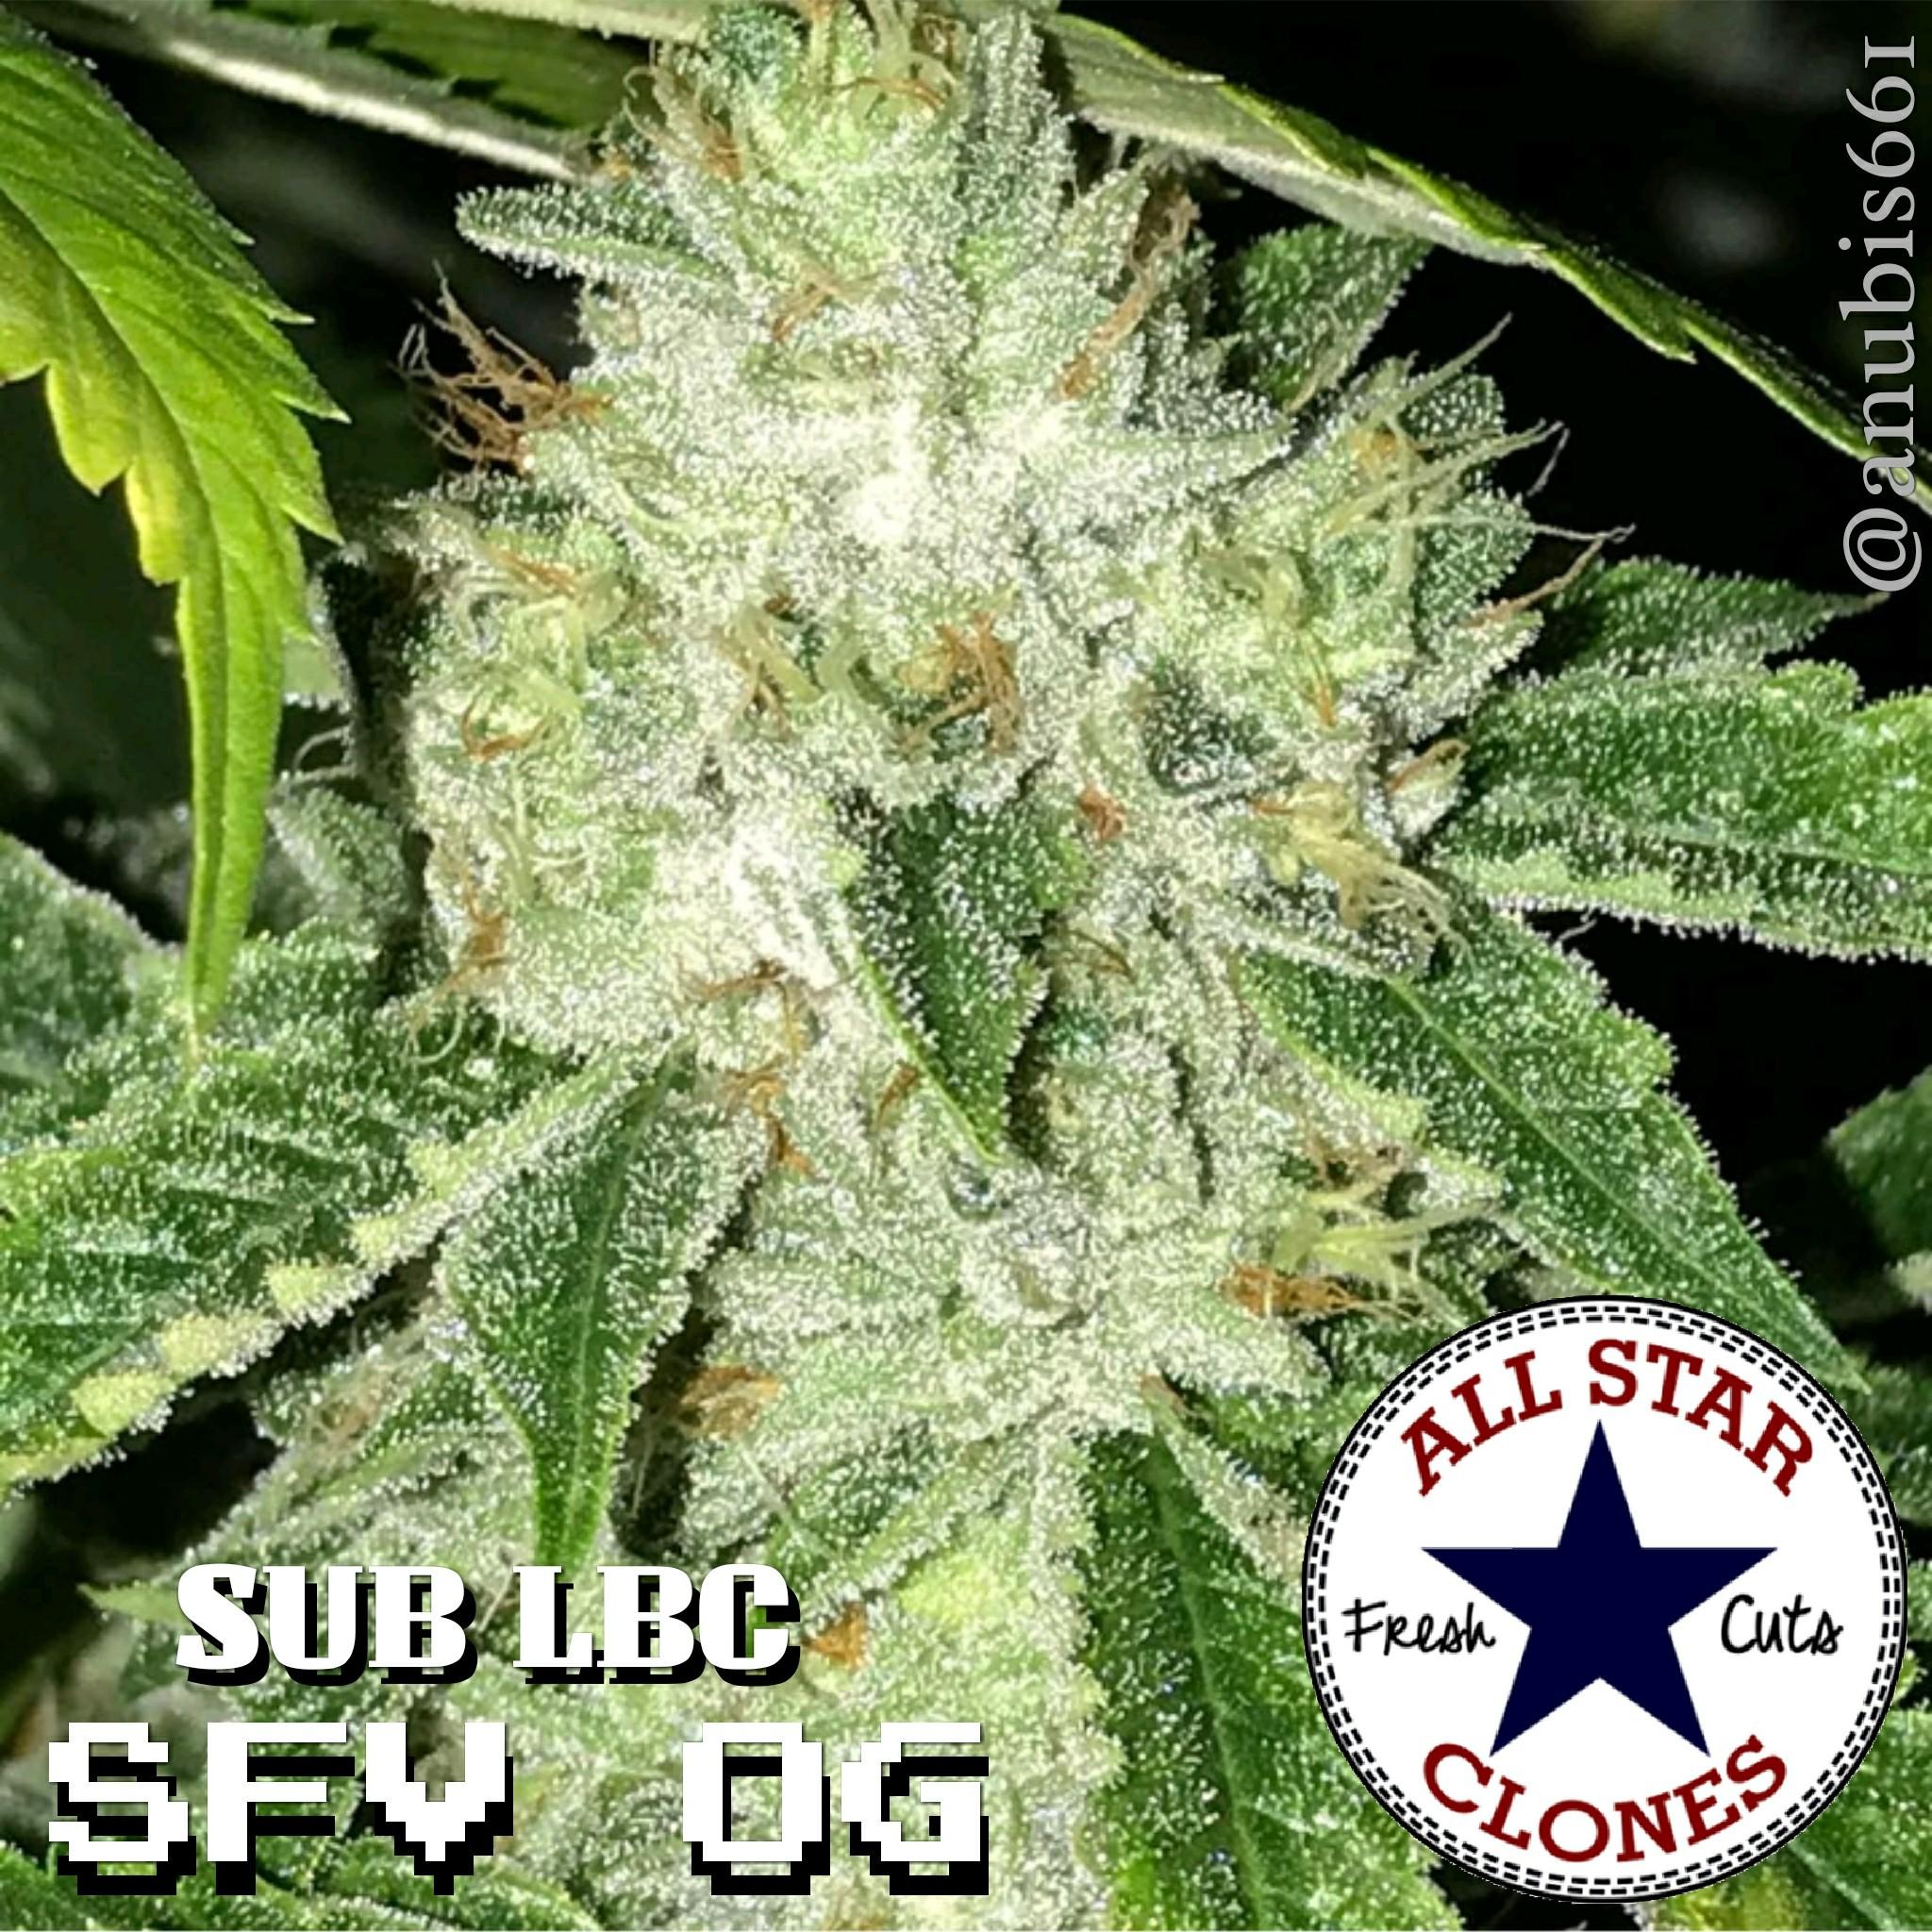 SFV OG - Sub LBC cut